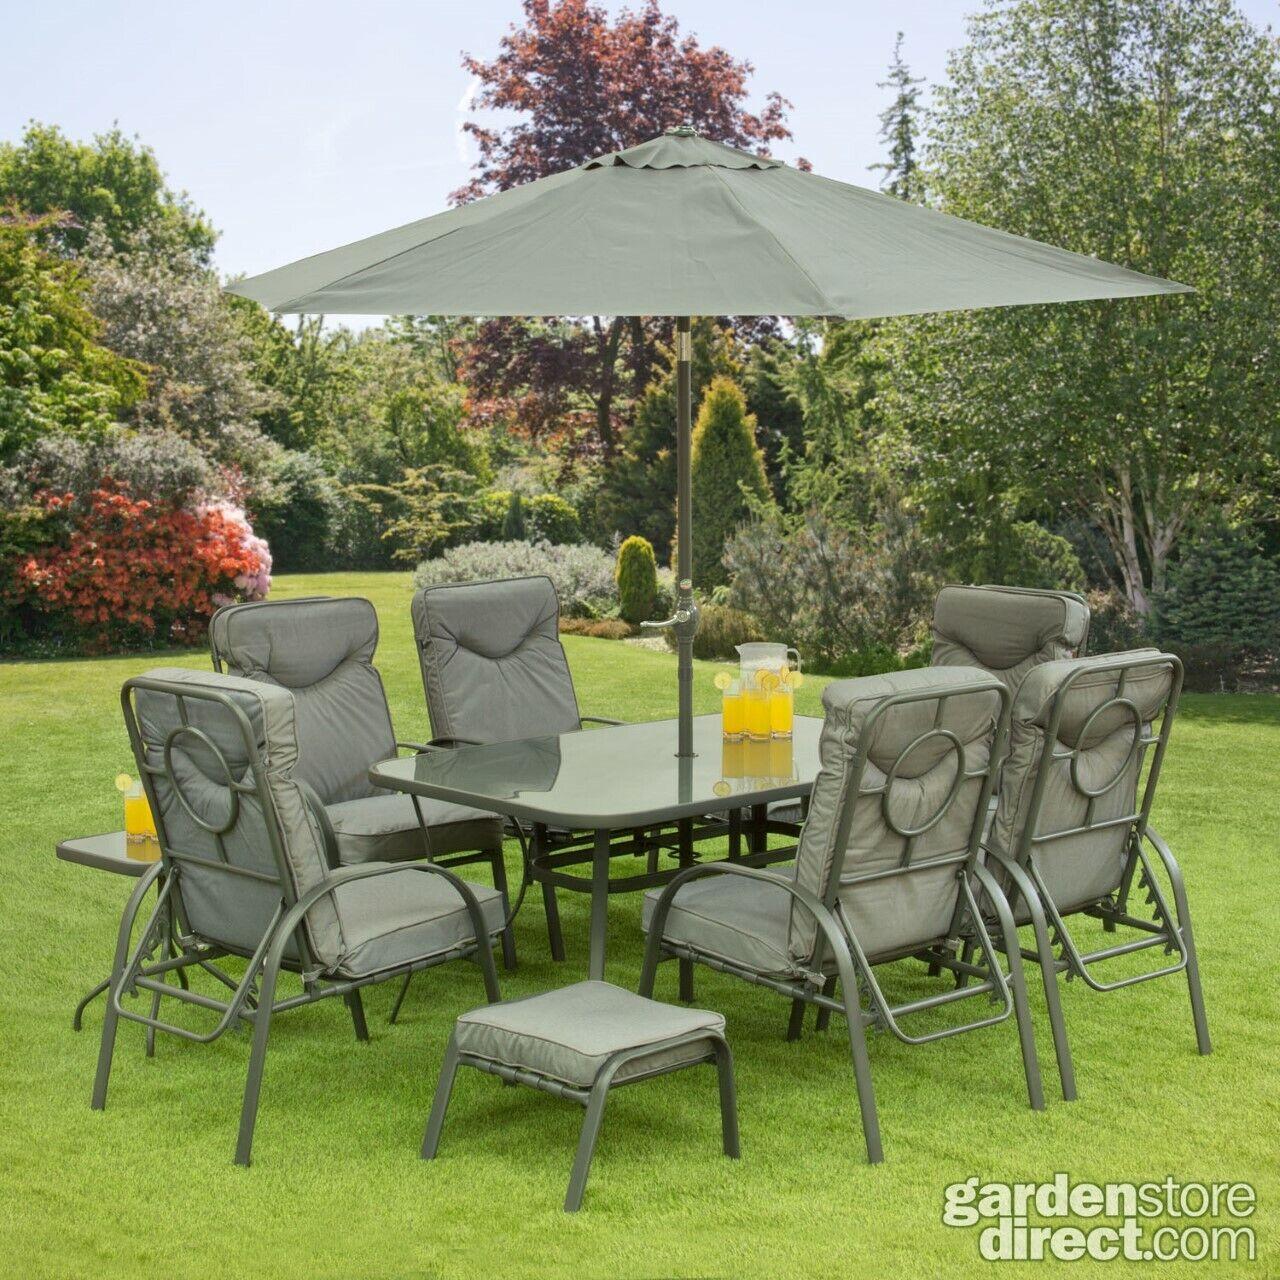 Garden Furniture - 11 Piece Garden Furniture Set Table Chairs Foot Stools & Parasol Matching Grey